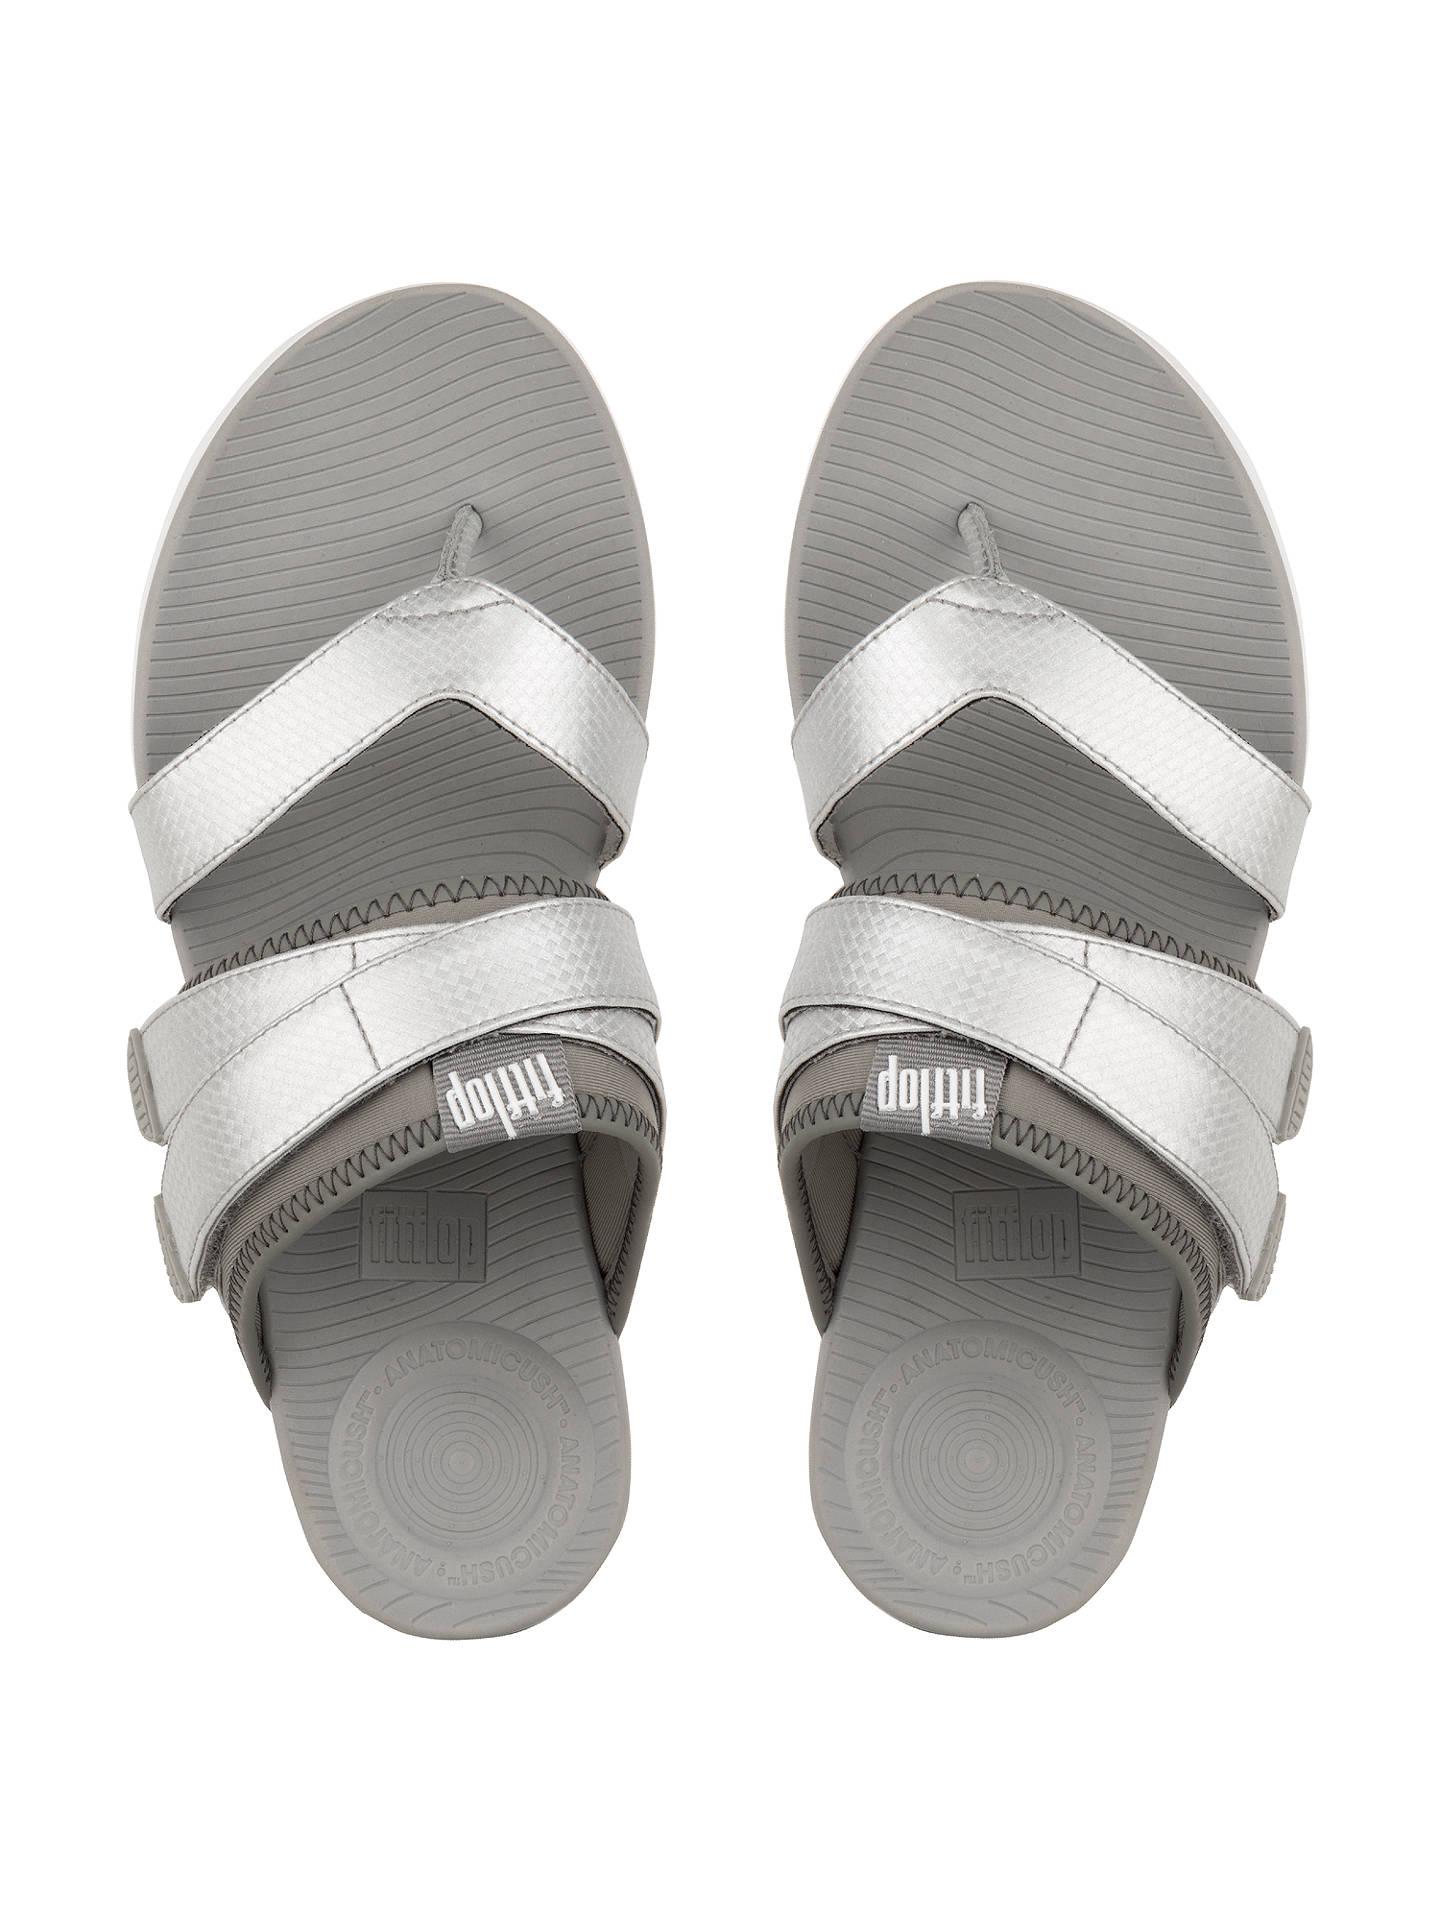 84e993abc2585 ... Buy FitFlop Neoflex Toe Post Sandals